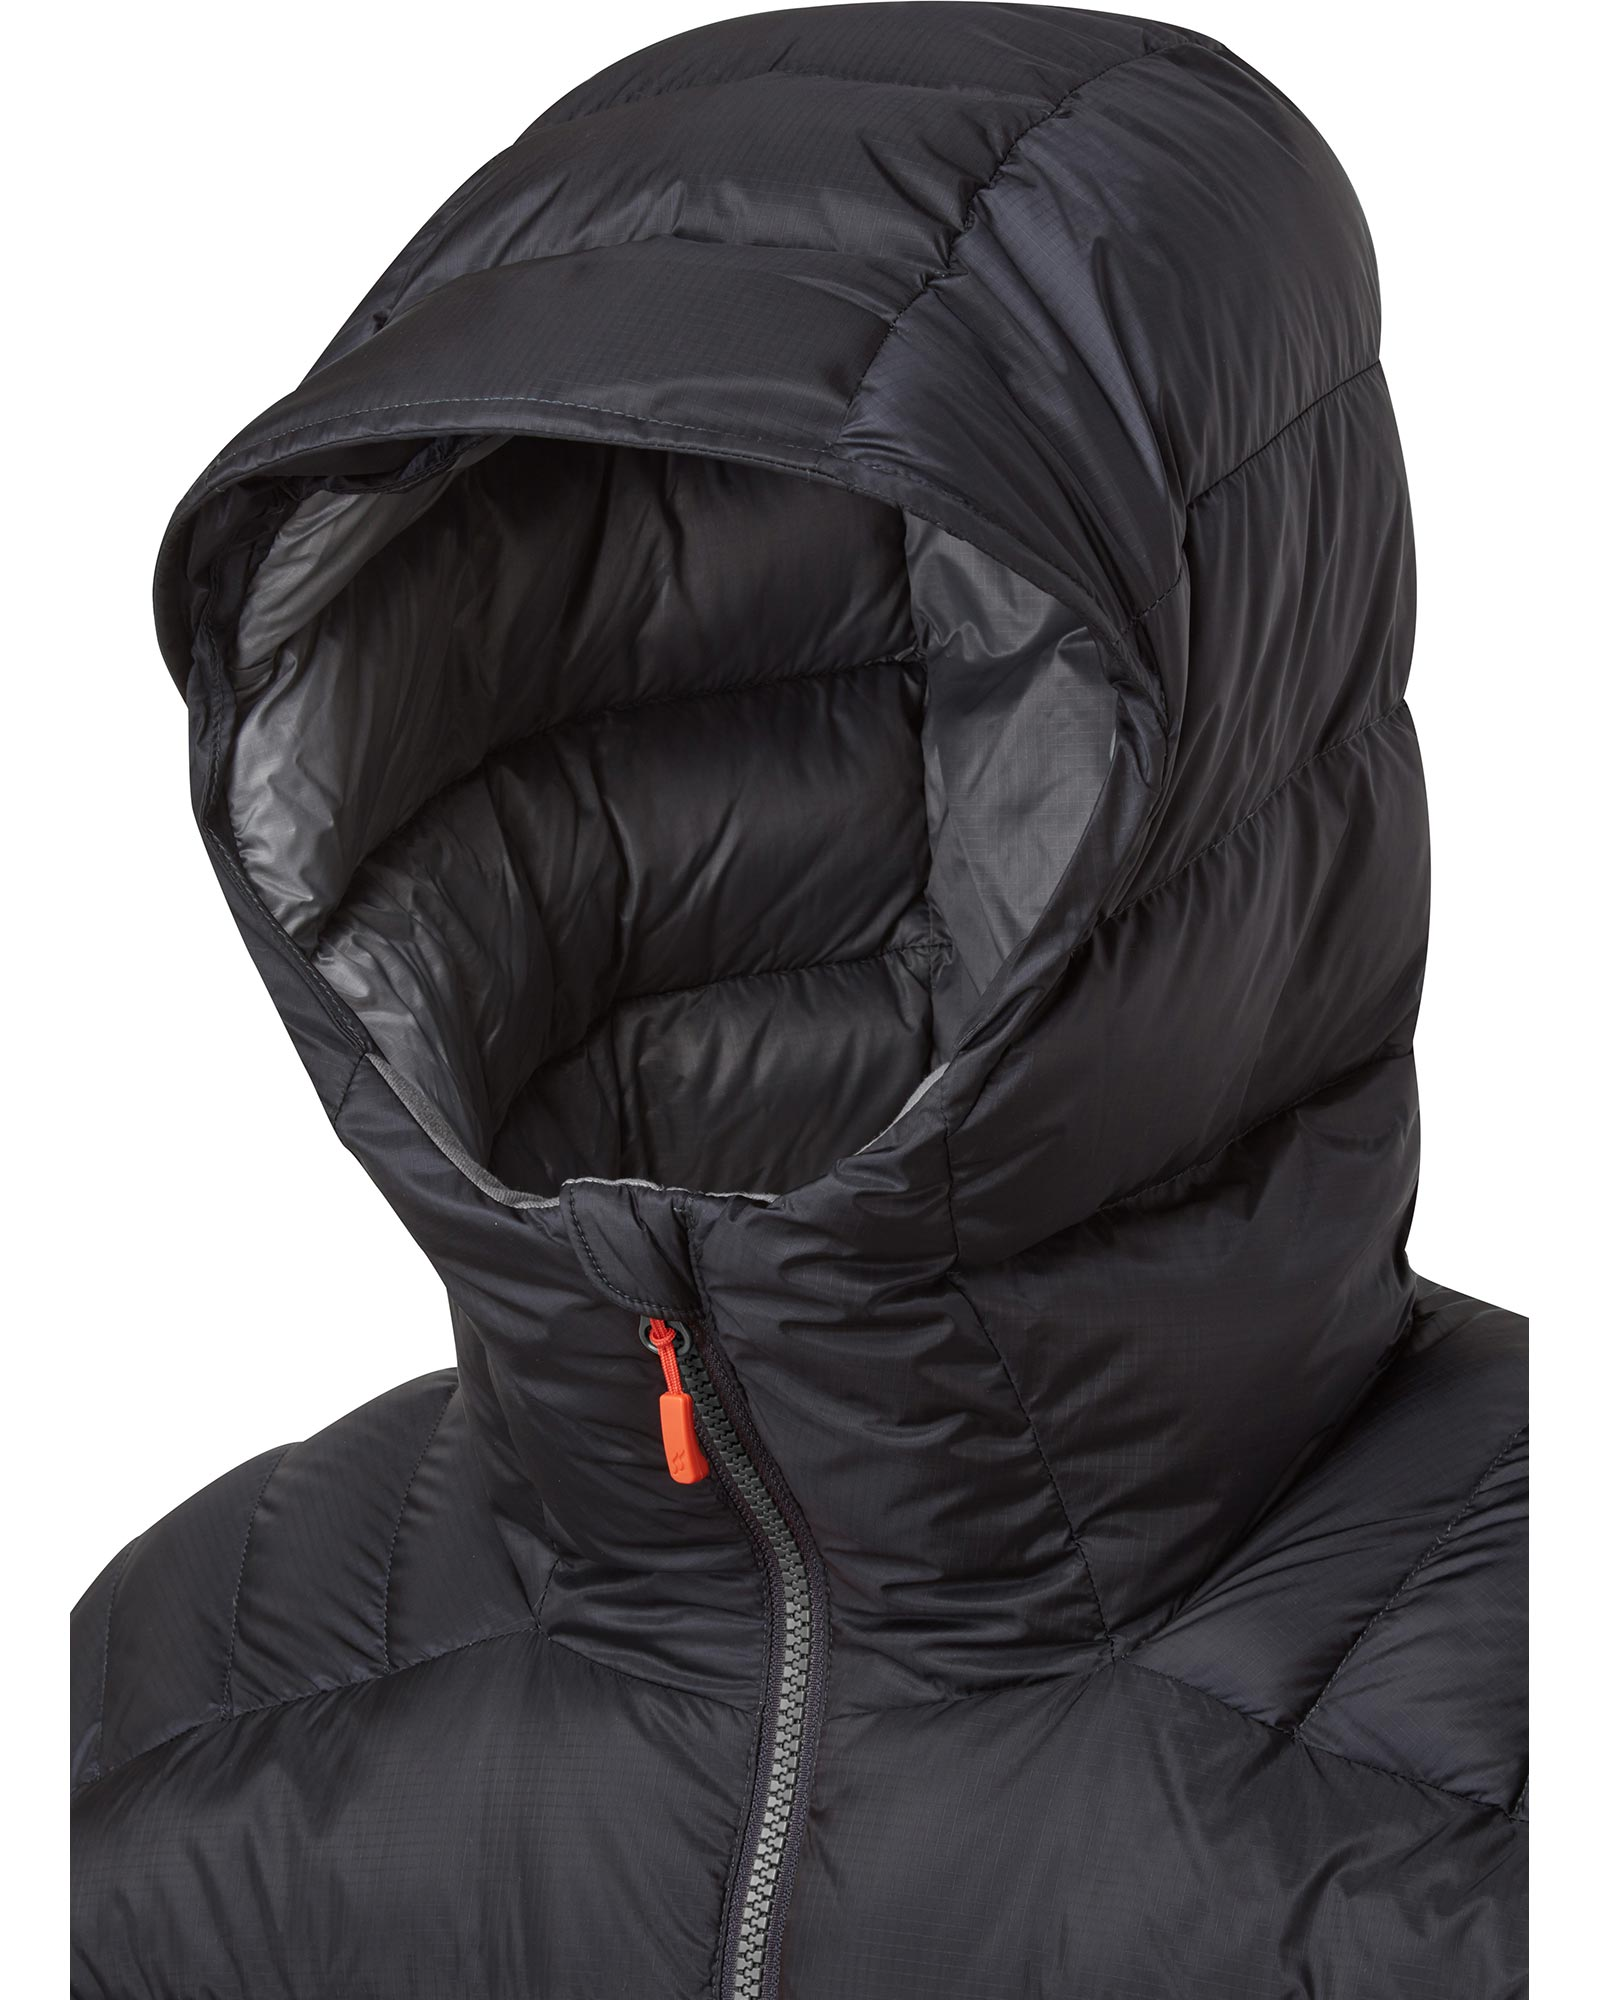 Rab Electron Pro Men's Jacket